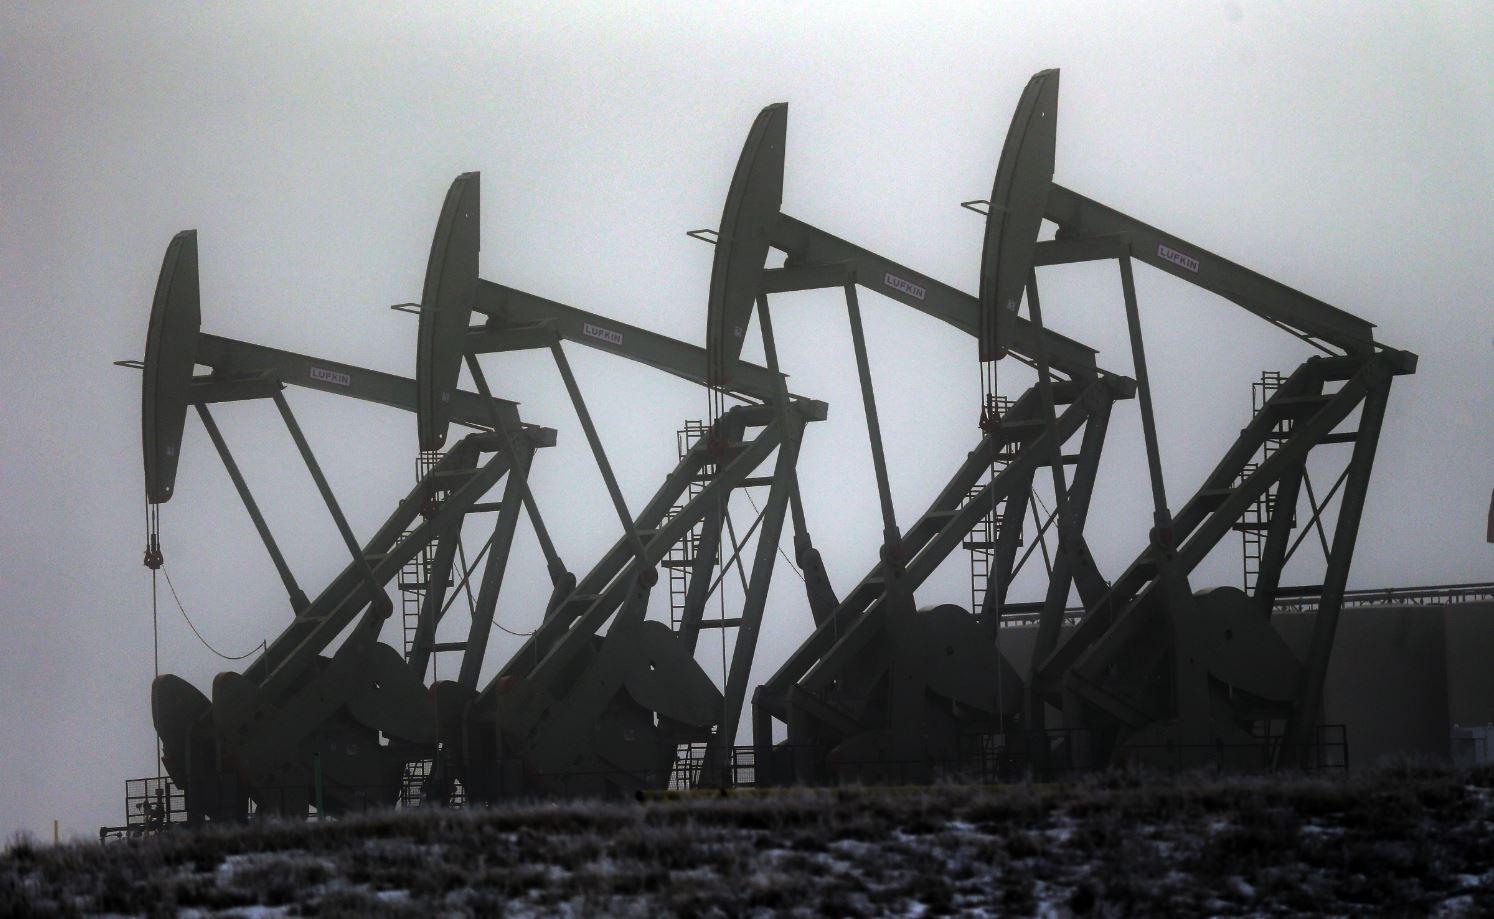 EE UU aumentó sus reservas de petróleo a 5,8 millones de barriles